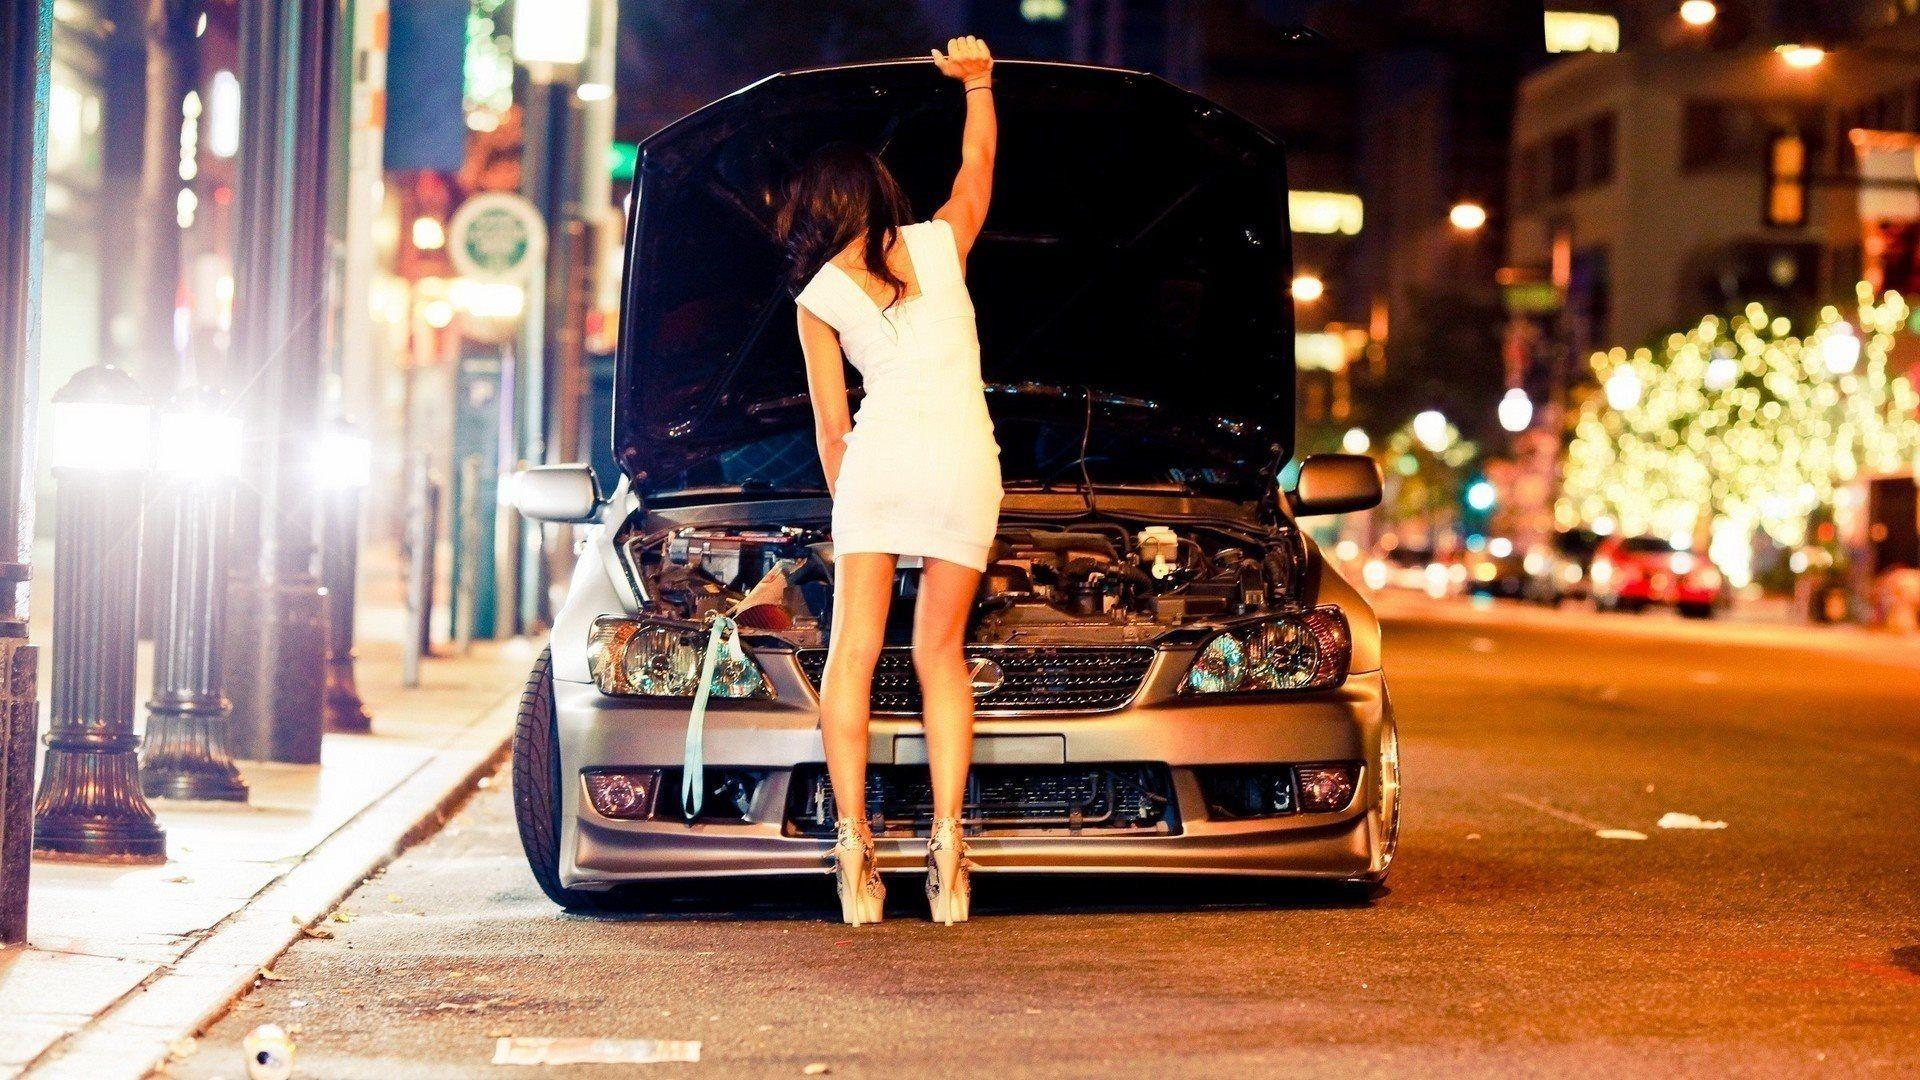 Lexus Is300 Girl Car 2014 Hd Wallpaper 2014 Car Girls Car Wallpapers Lexus Is300